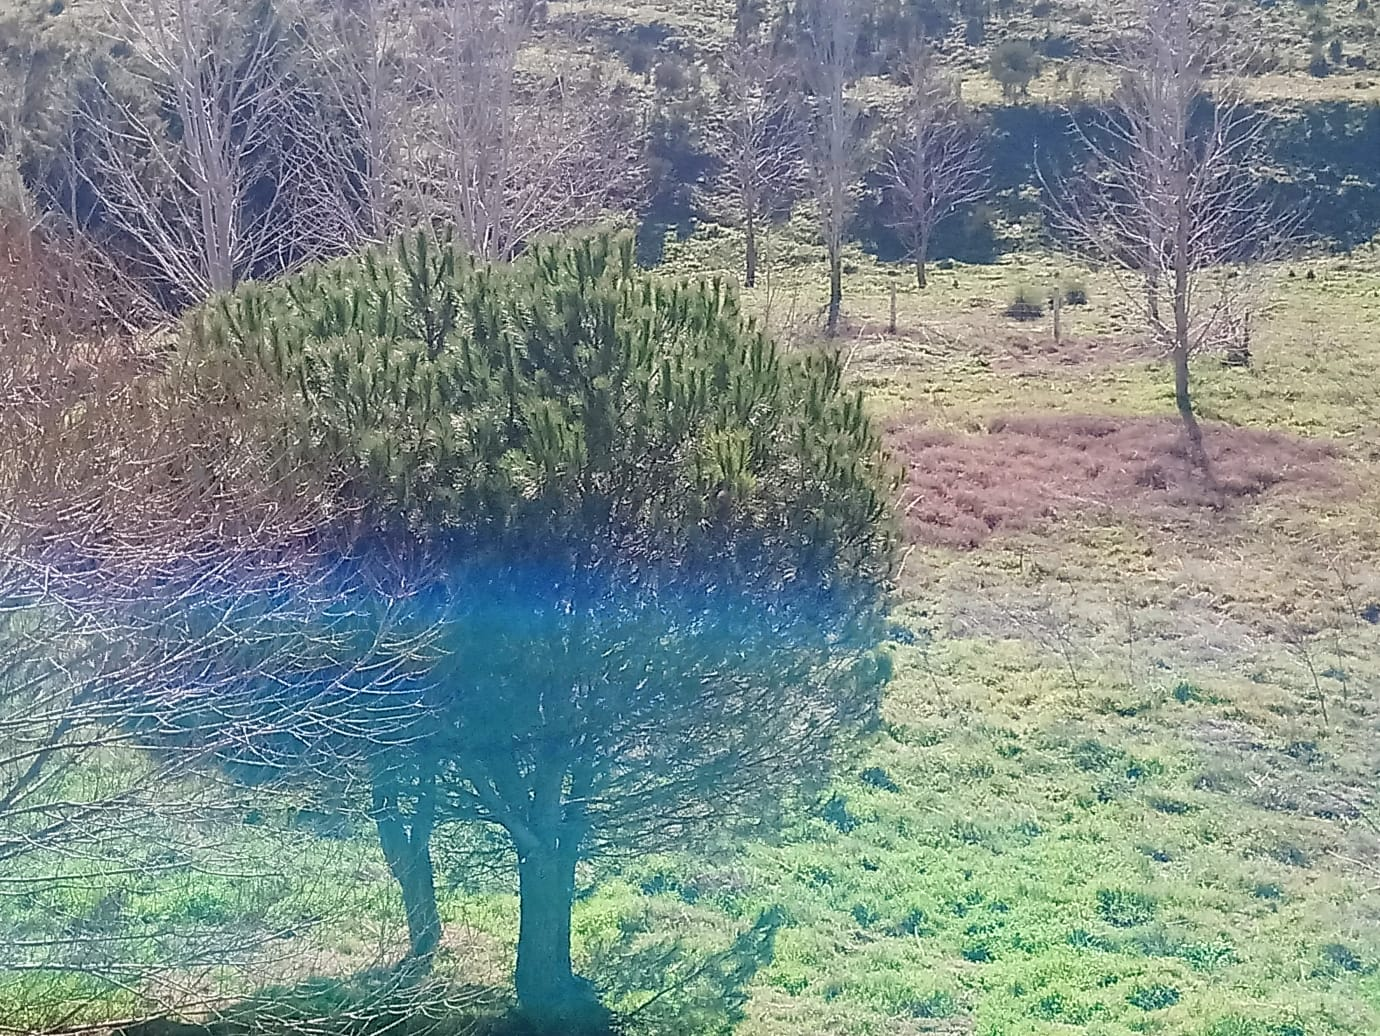 FINCA DE 10 HECTÁREAS EN TERRADILLOS (REF: Alb-3) - foto 2 baa1bbbb-3185-4920-947a-8b32ab7748fd.jpg